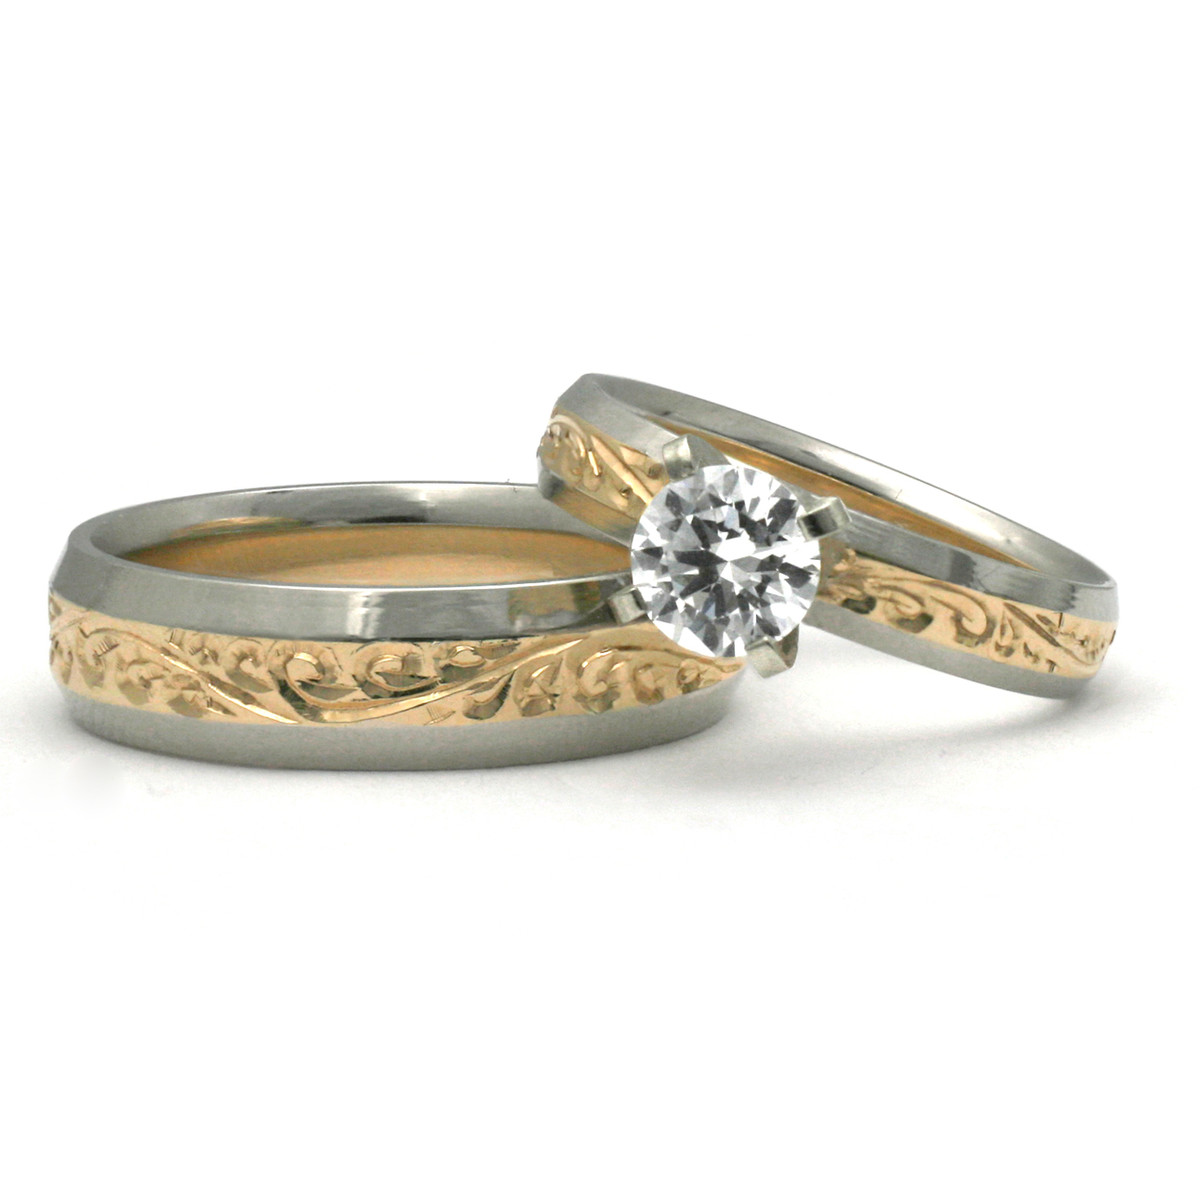 honolulu jewelry company - jewelry - honolulu, hi - weddingwire